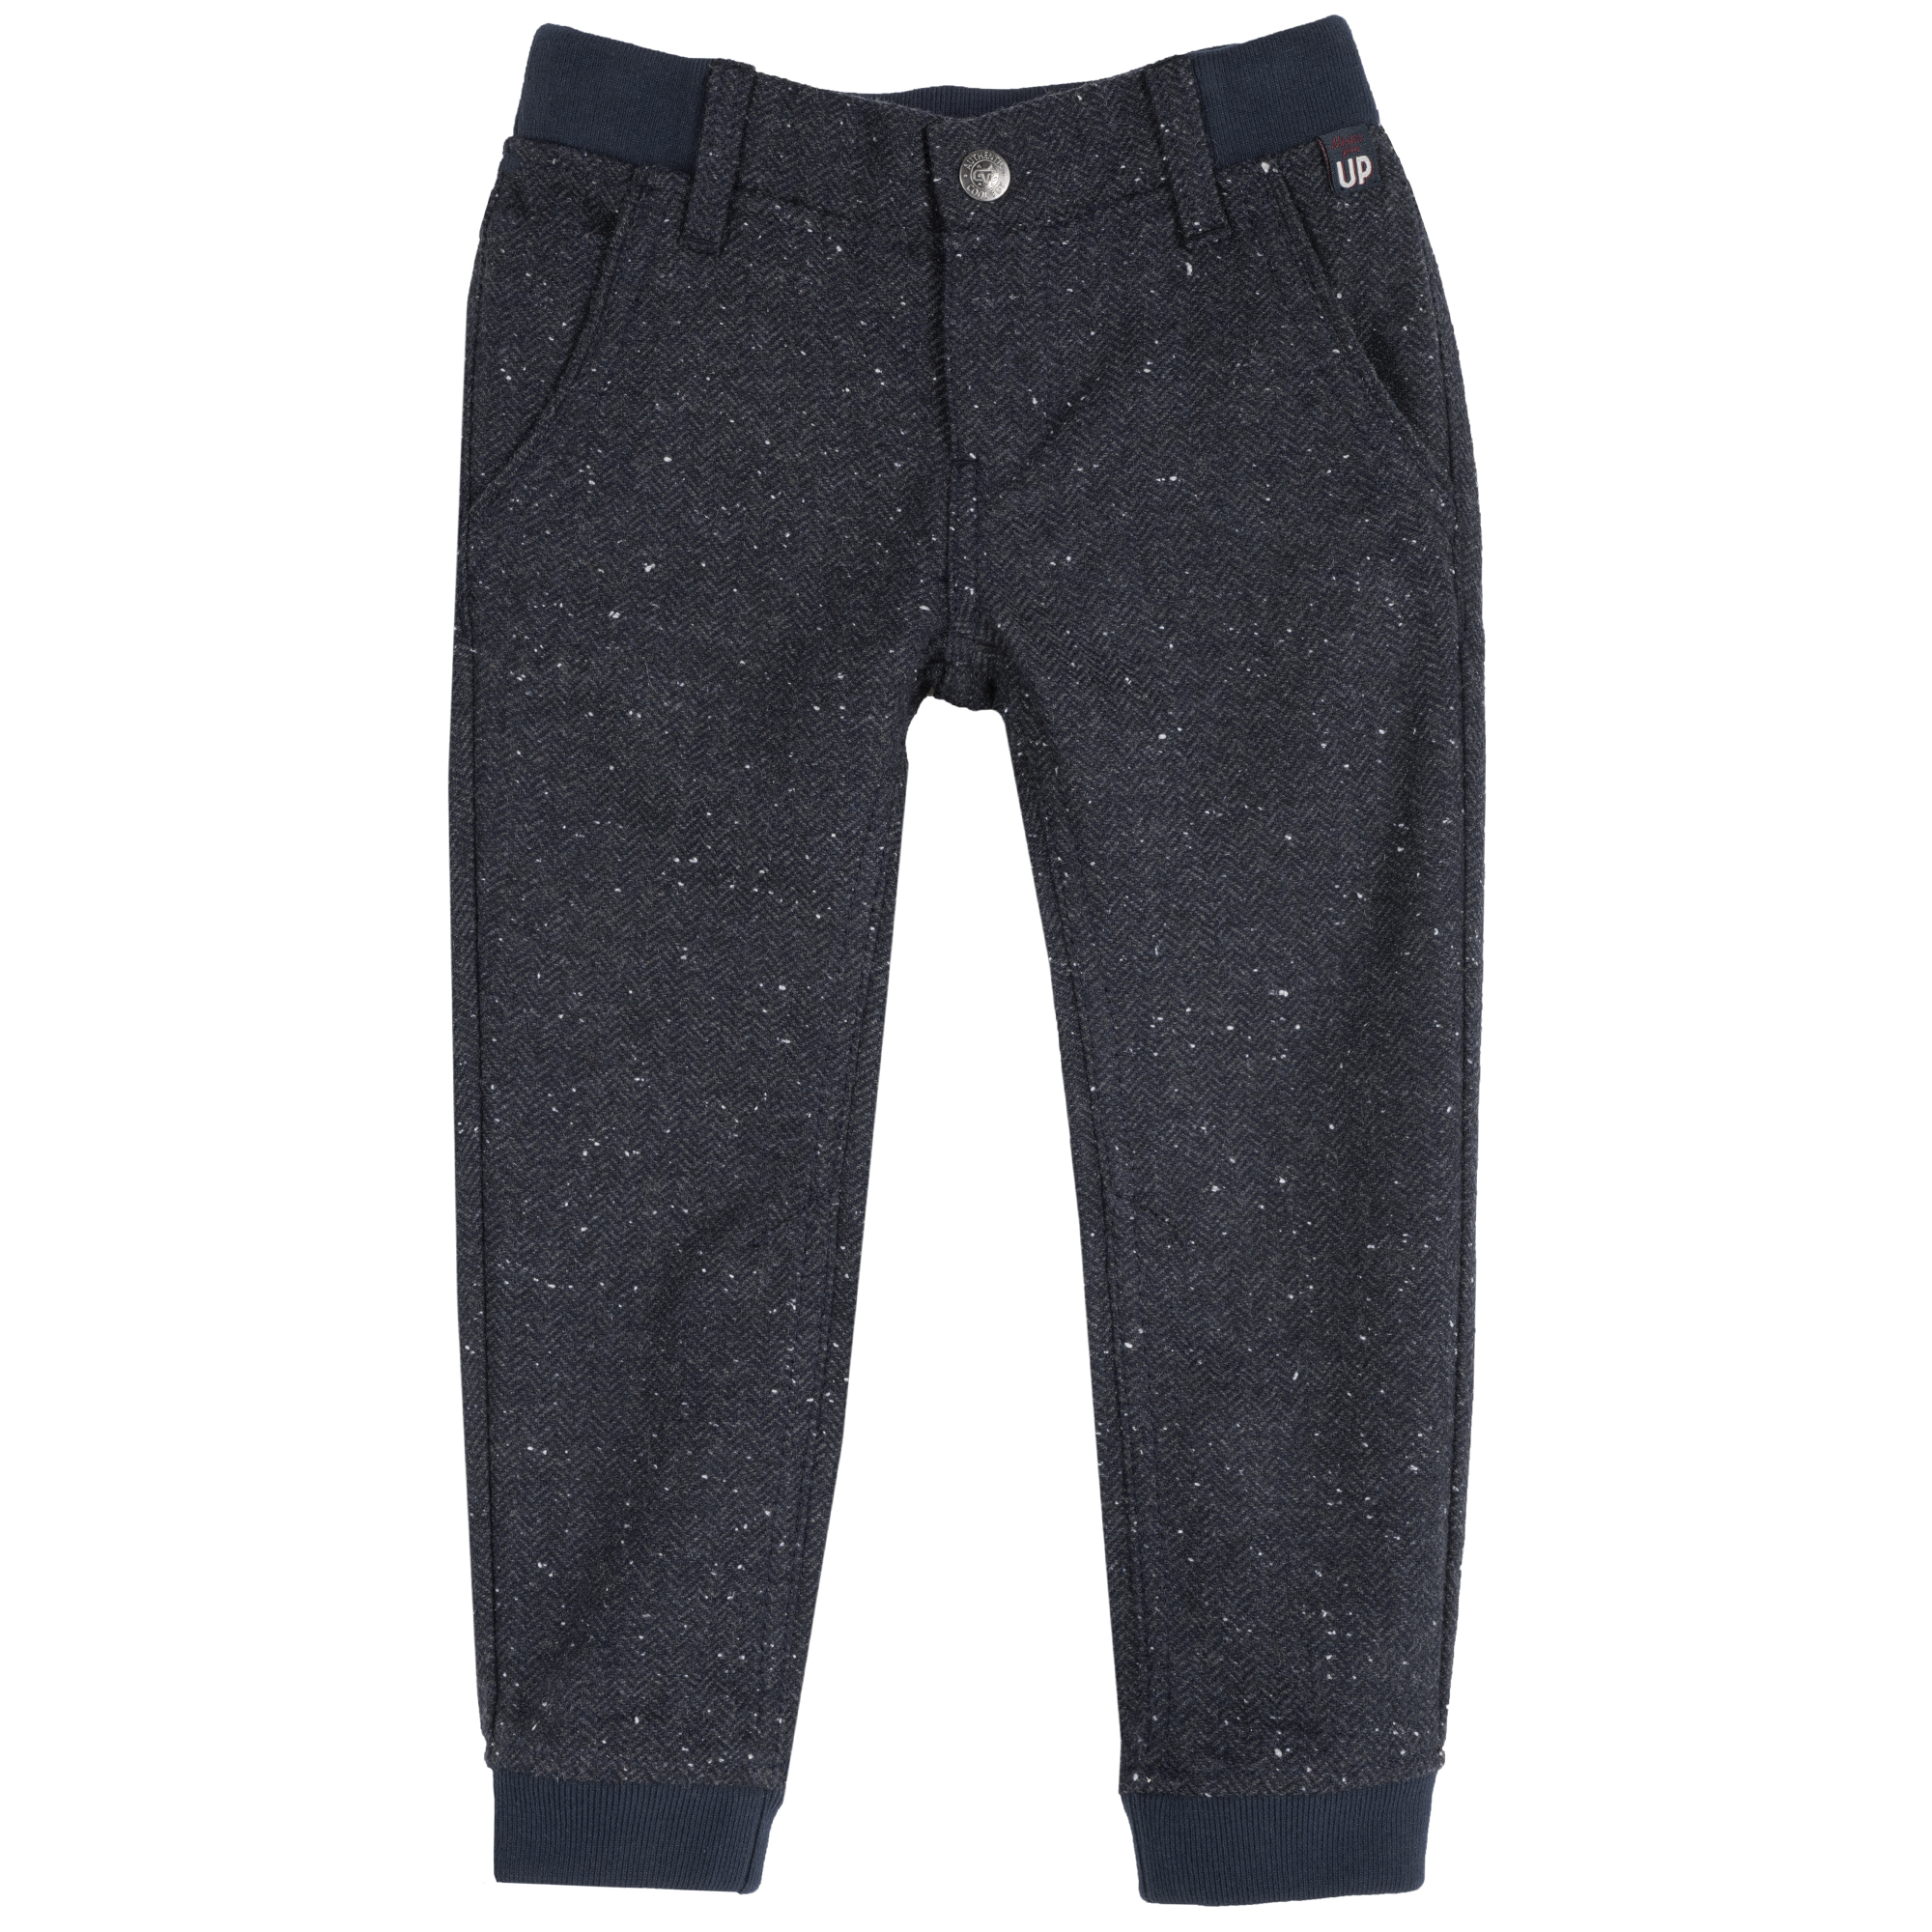 Pantalon copii Chicco, albastru inchis din categoria Pantaloni copii